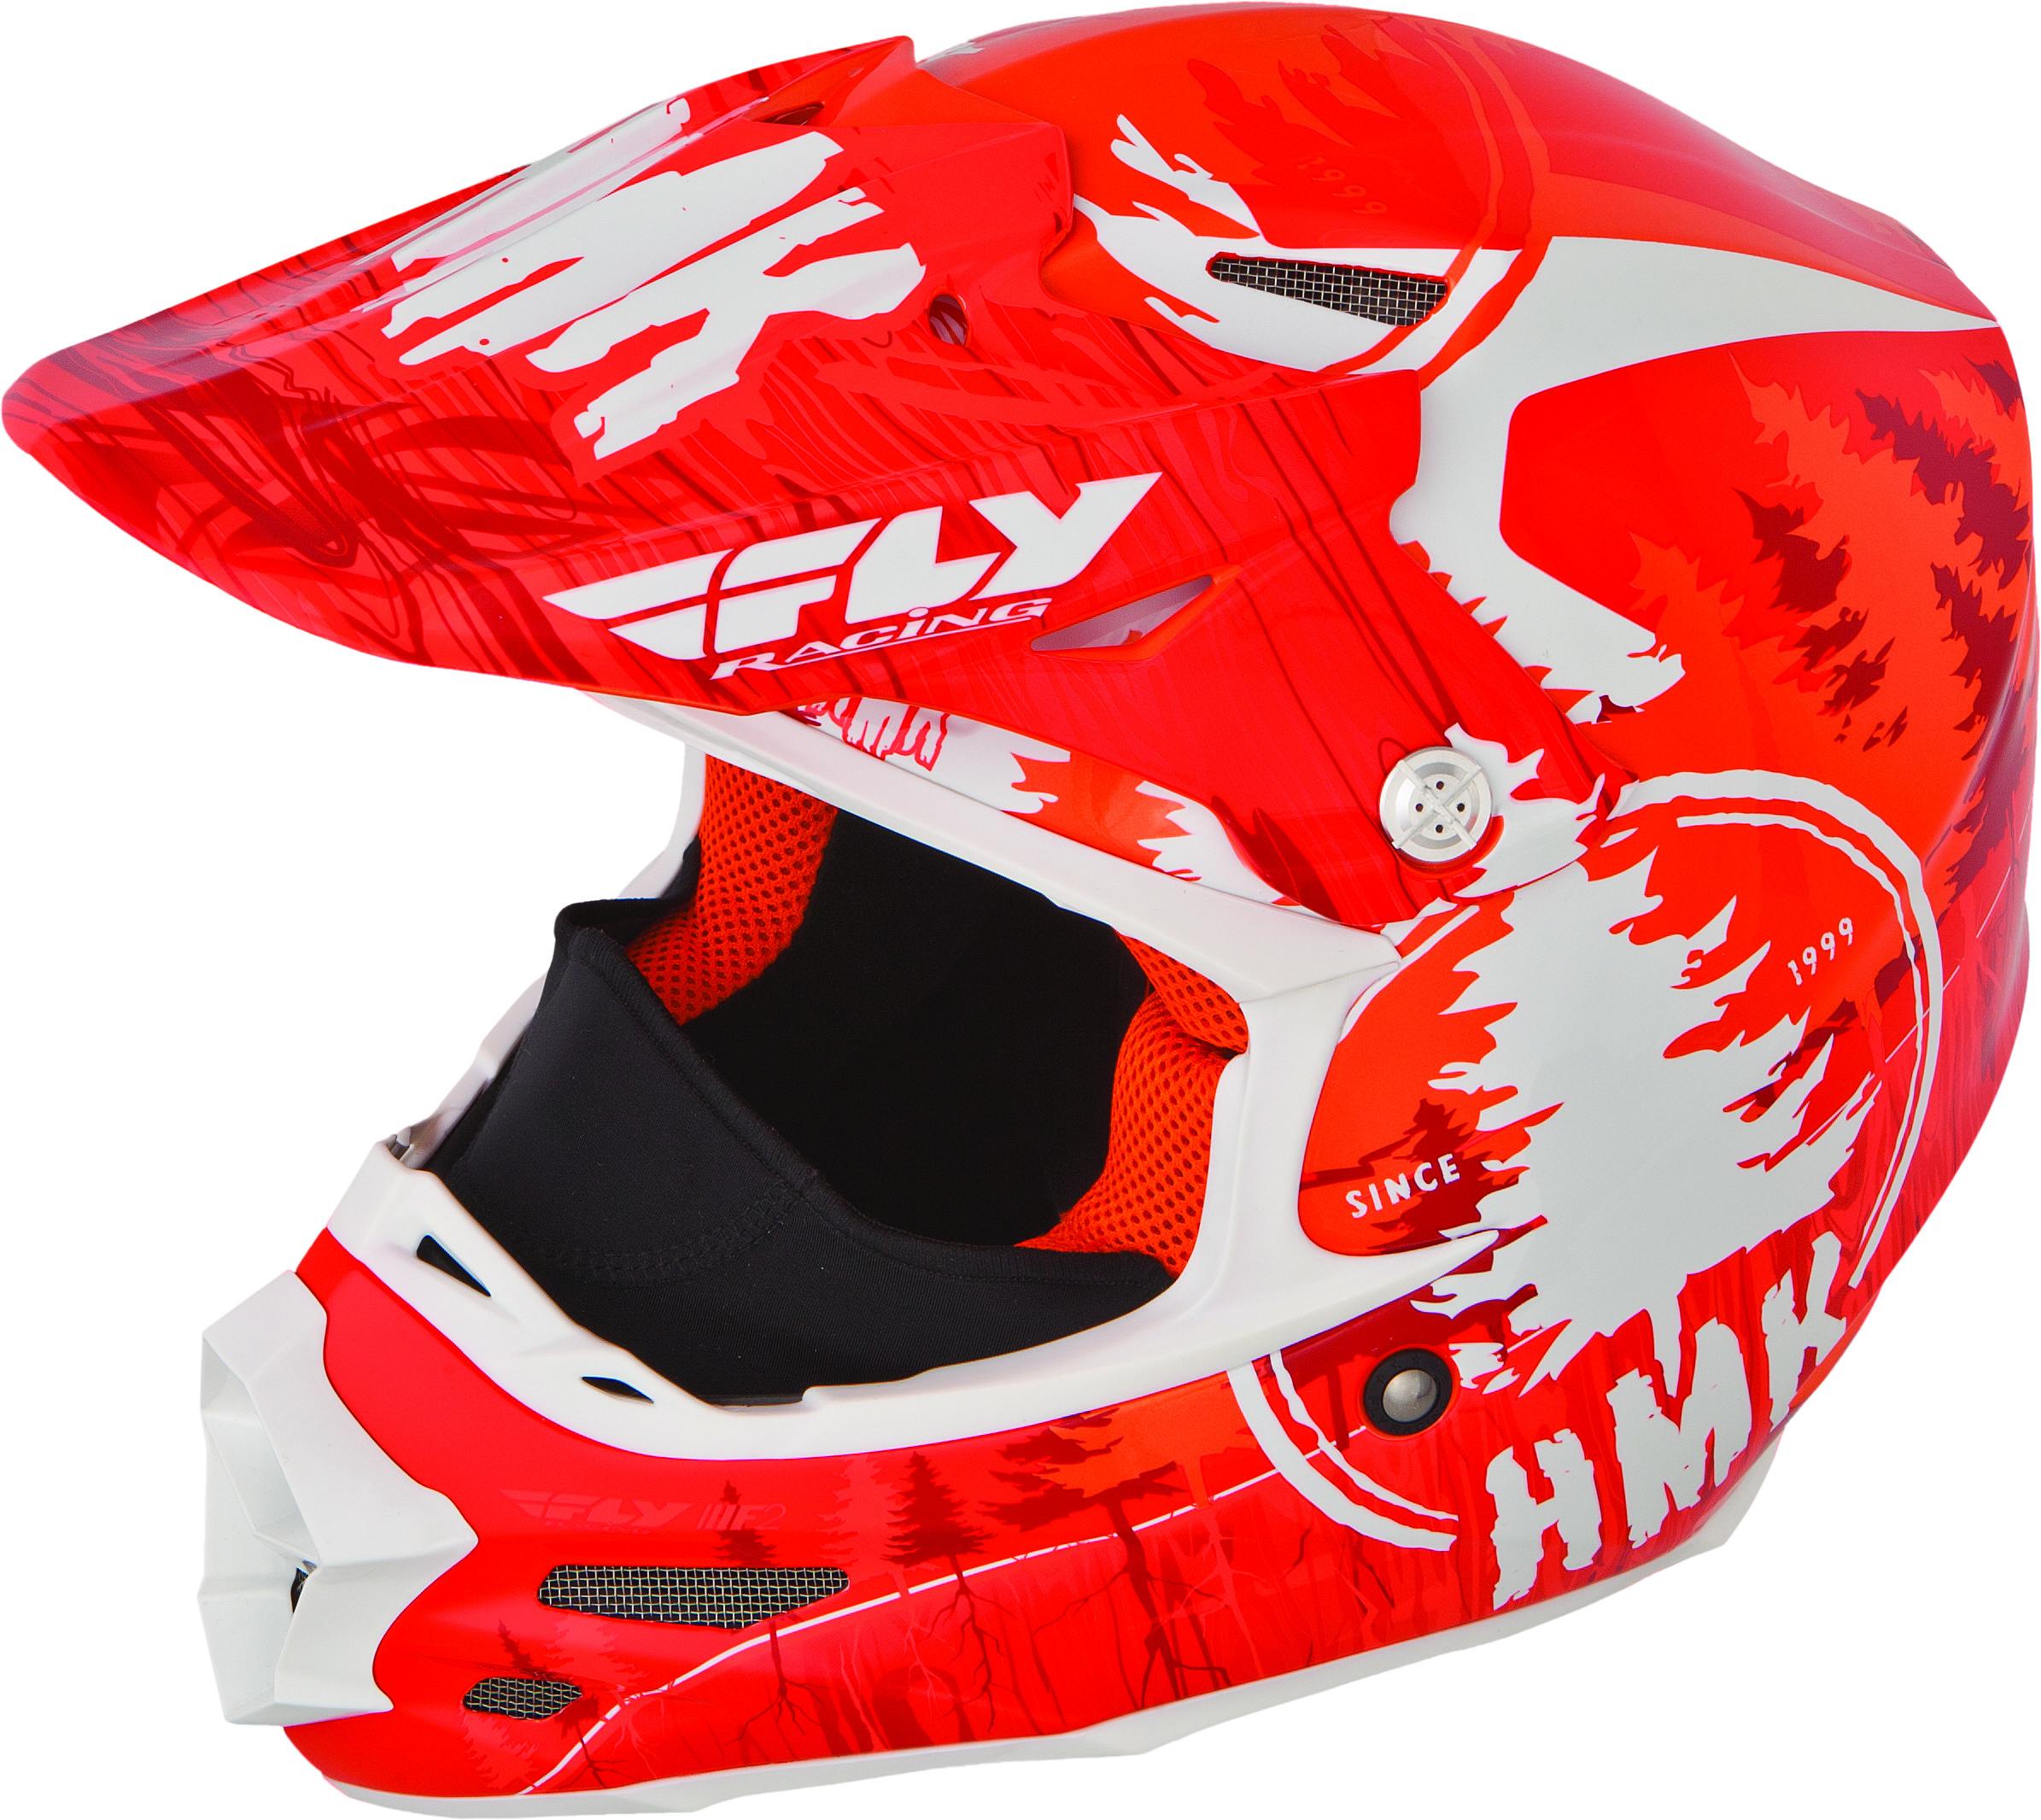 F2 Carbon Hmk Pro Stamp Helmet Orange/White 2X